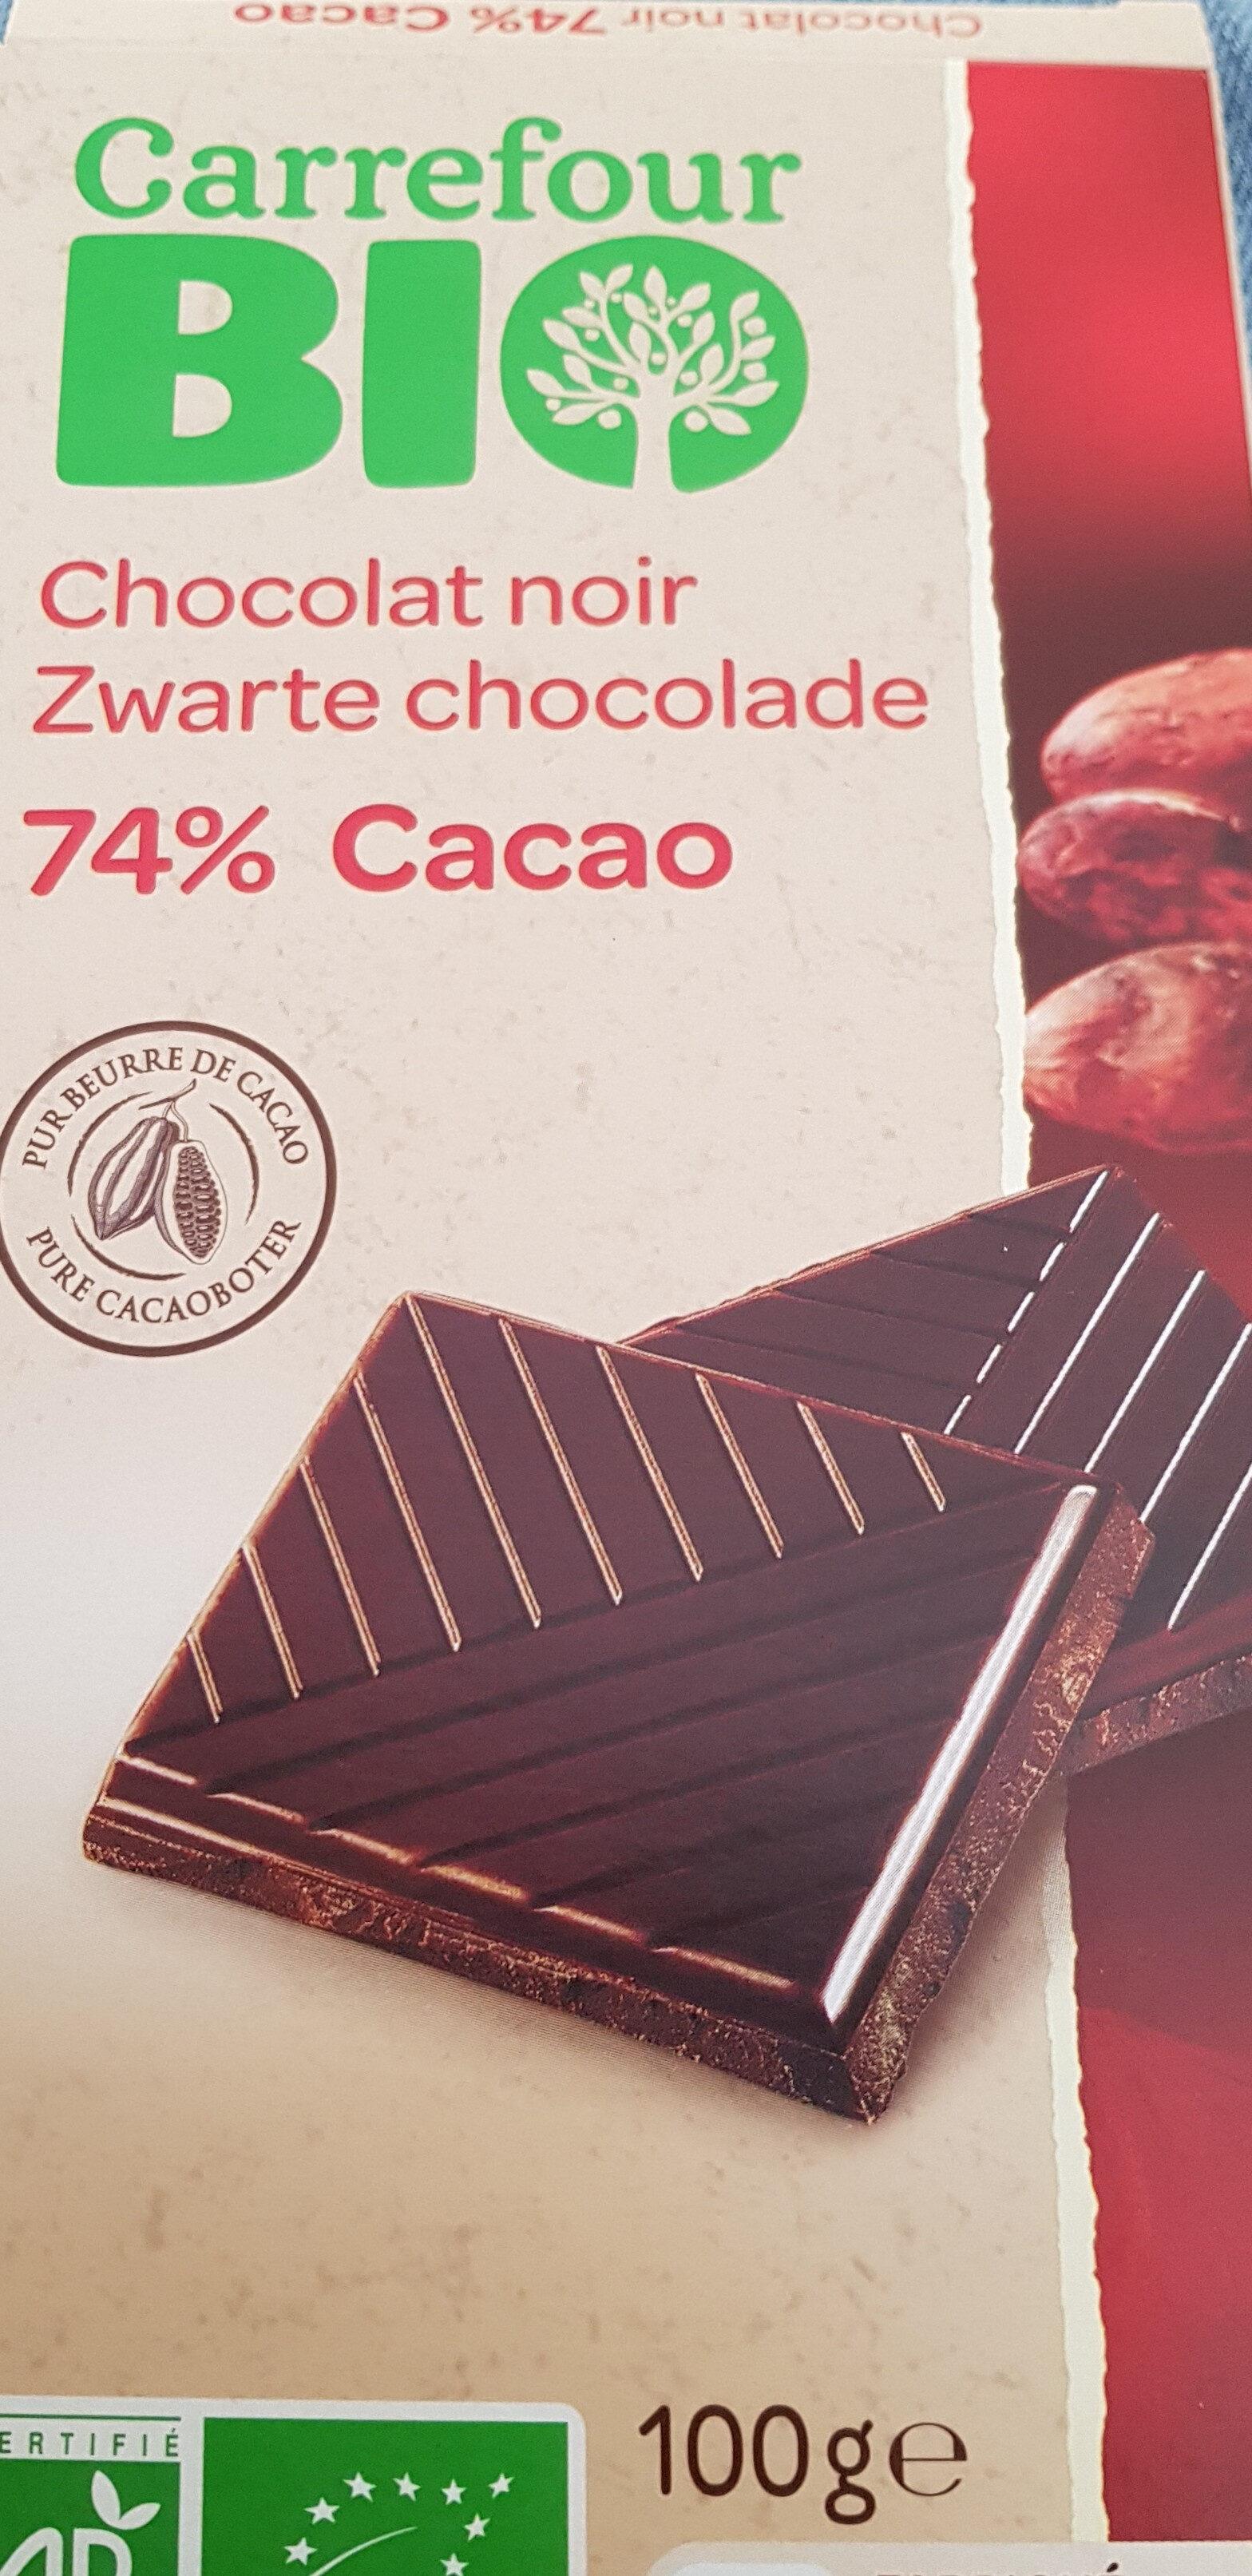 Chocolat noir 74% Cacao - Producto - fr